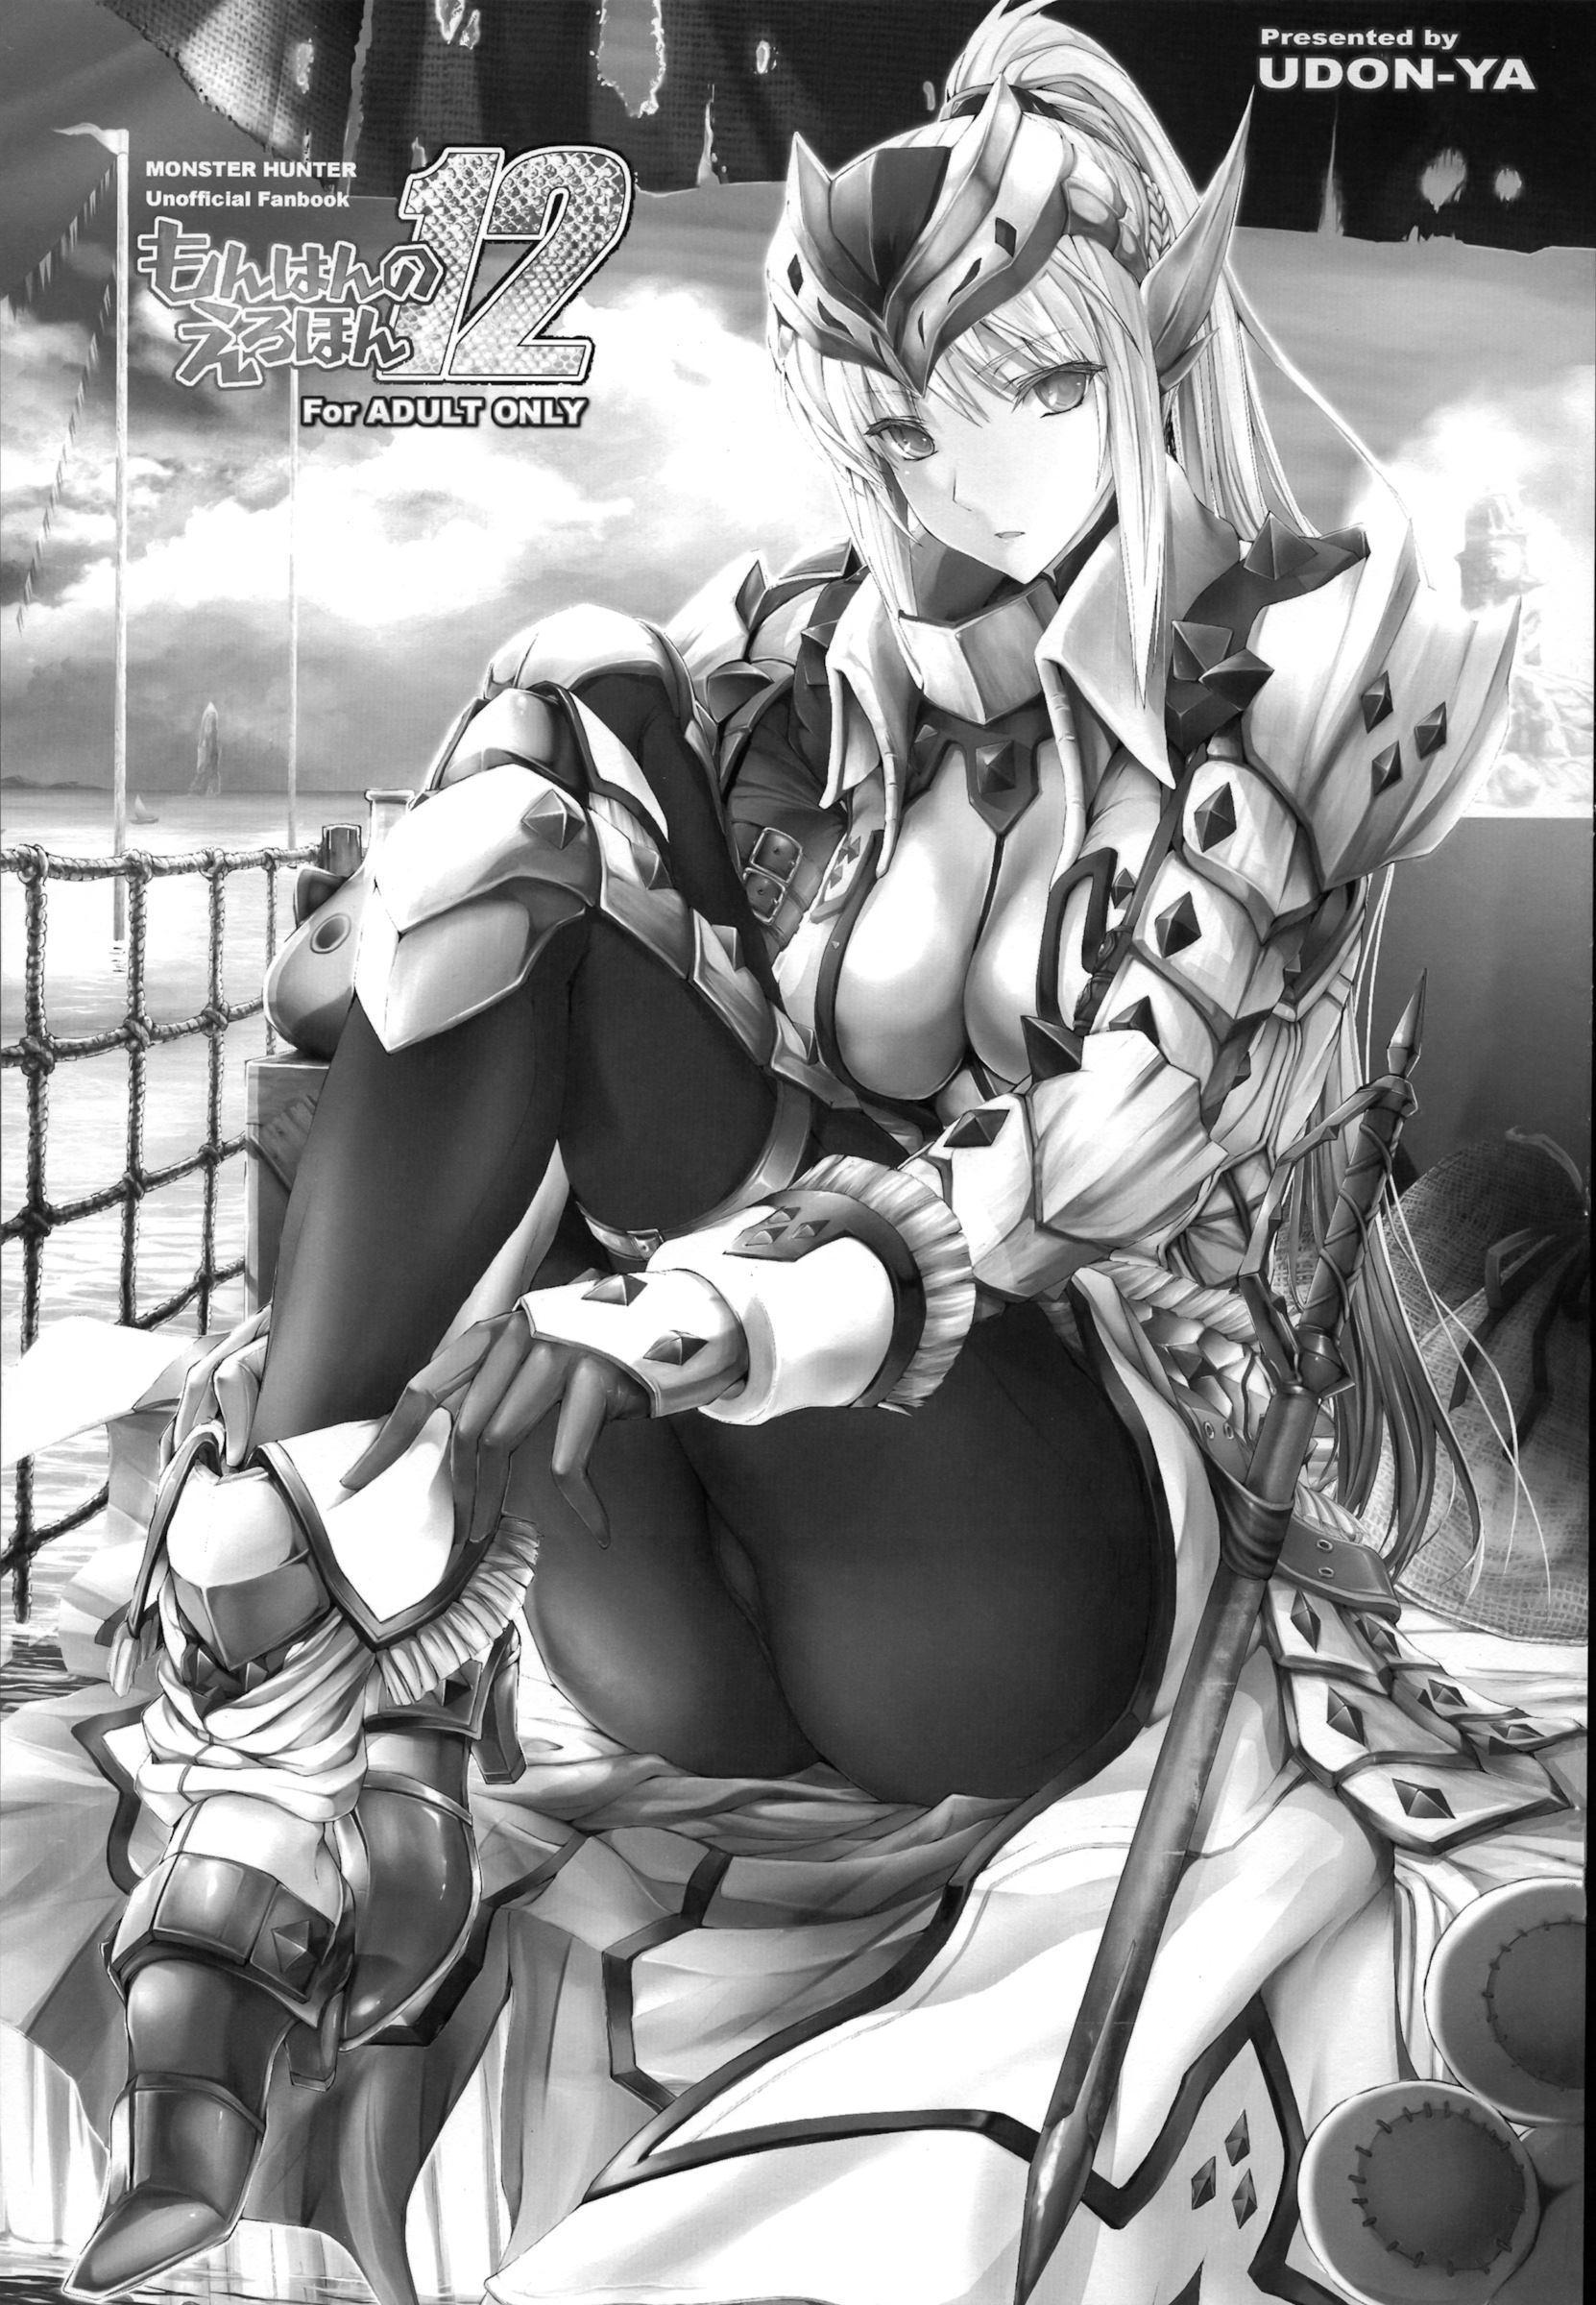 Hentai monster hunter sex image